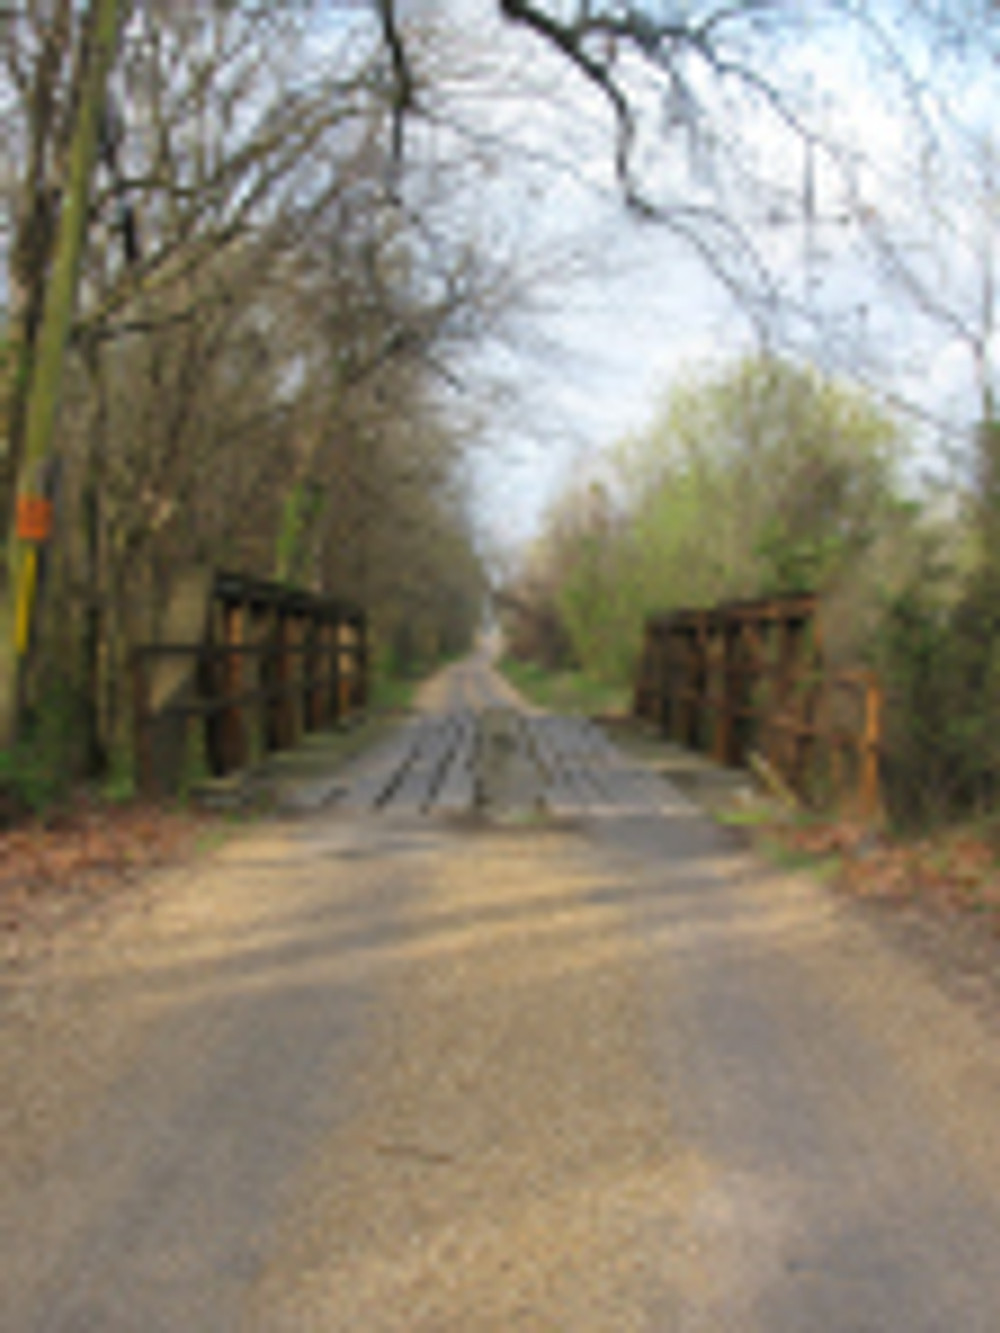 Bankhead alignment in Arkansas (US 67)